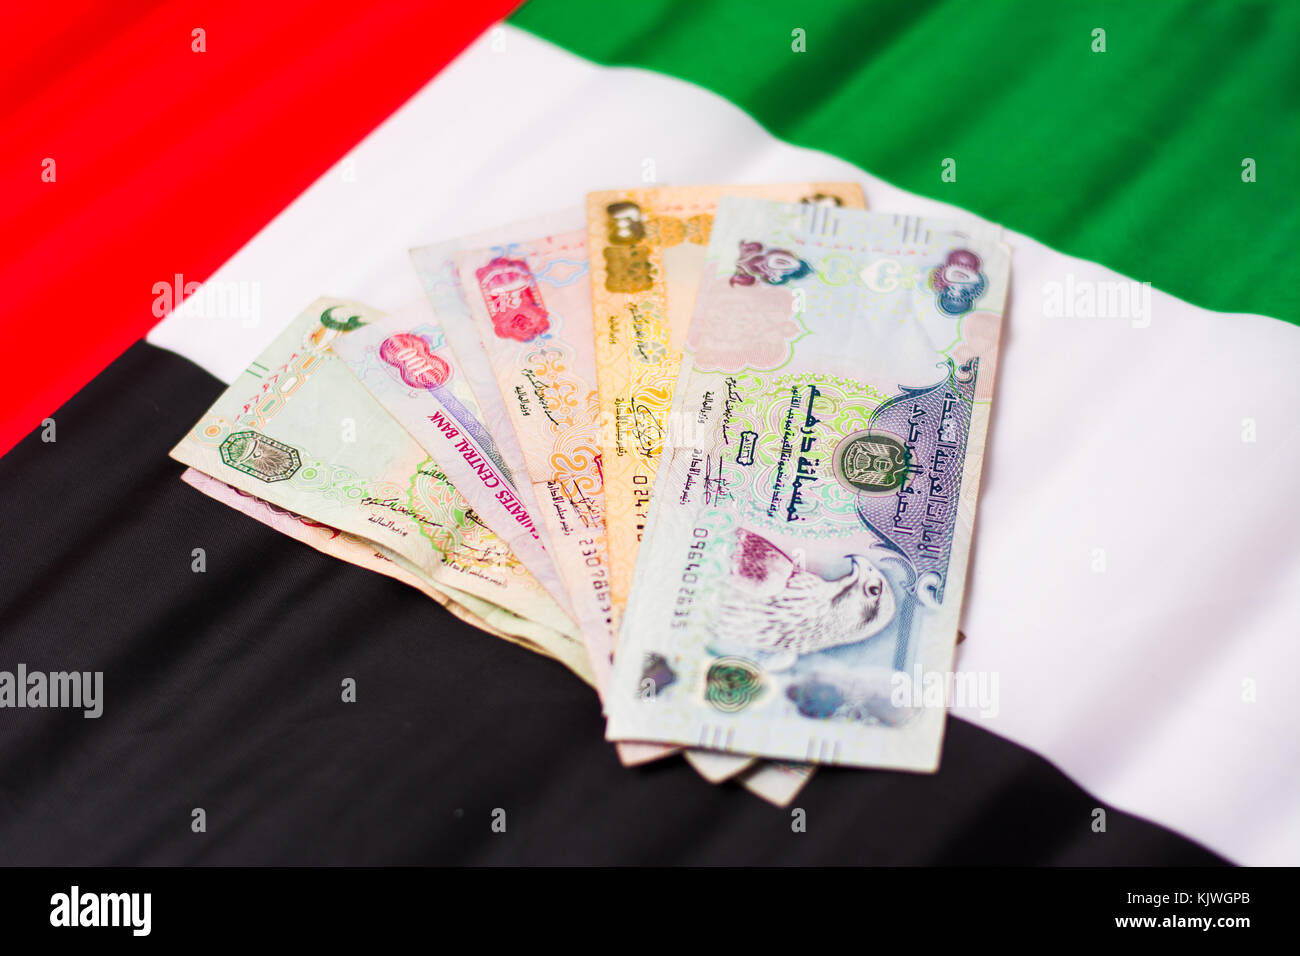 United arab emirates dirham banknotes on top of flag stock photo united arab emirates dirham banknotes on top of flag biocorpaavc